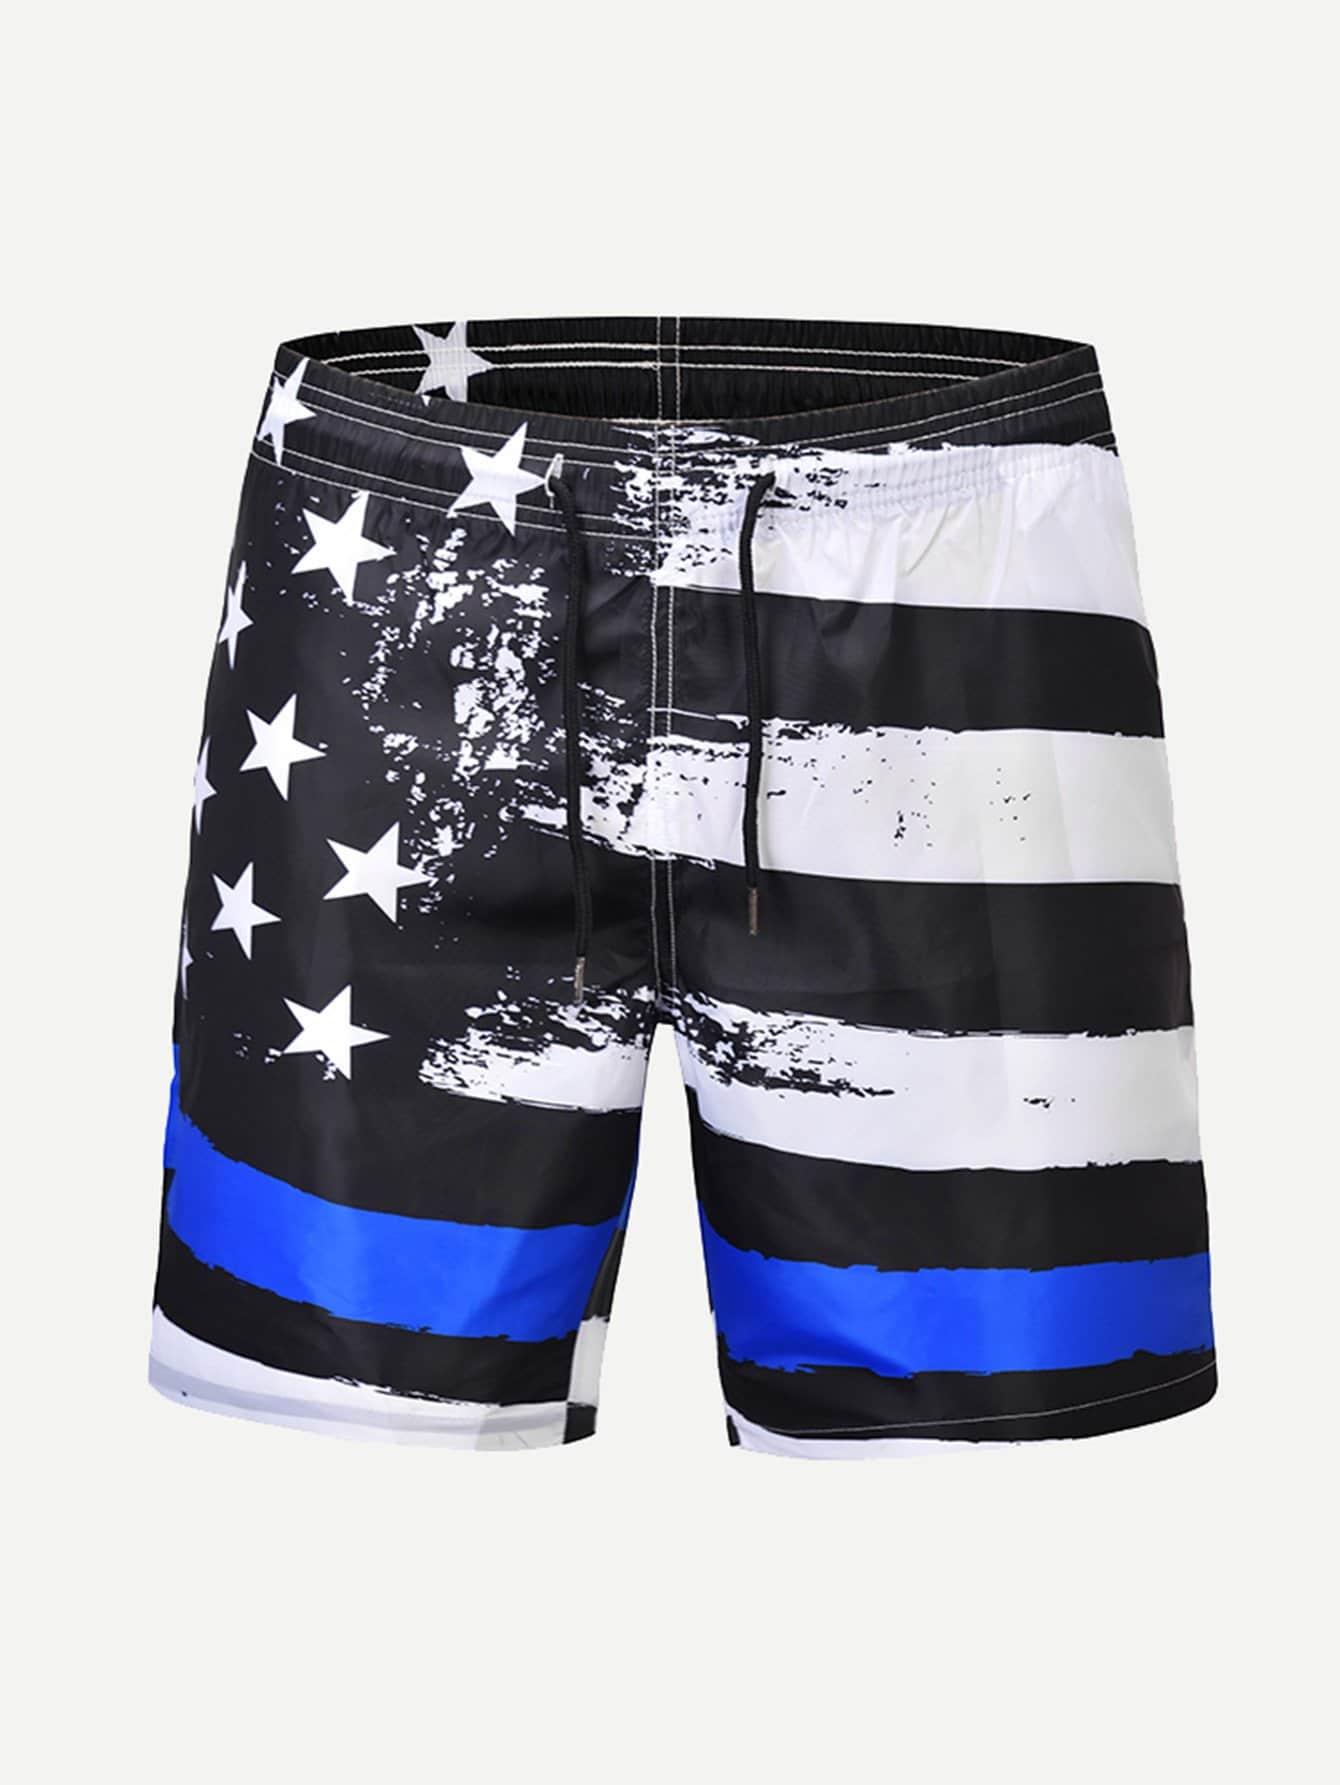 Men Star And Striped Print Drawstring Beach Shorts men colorful striped drawstring shorts